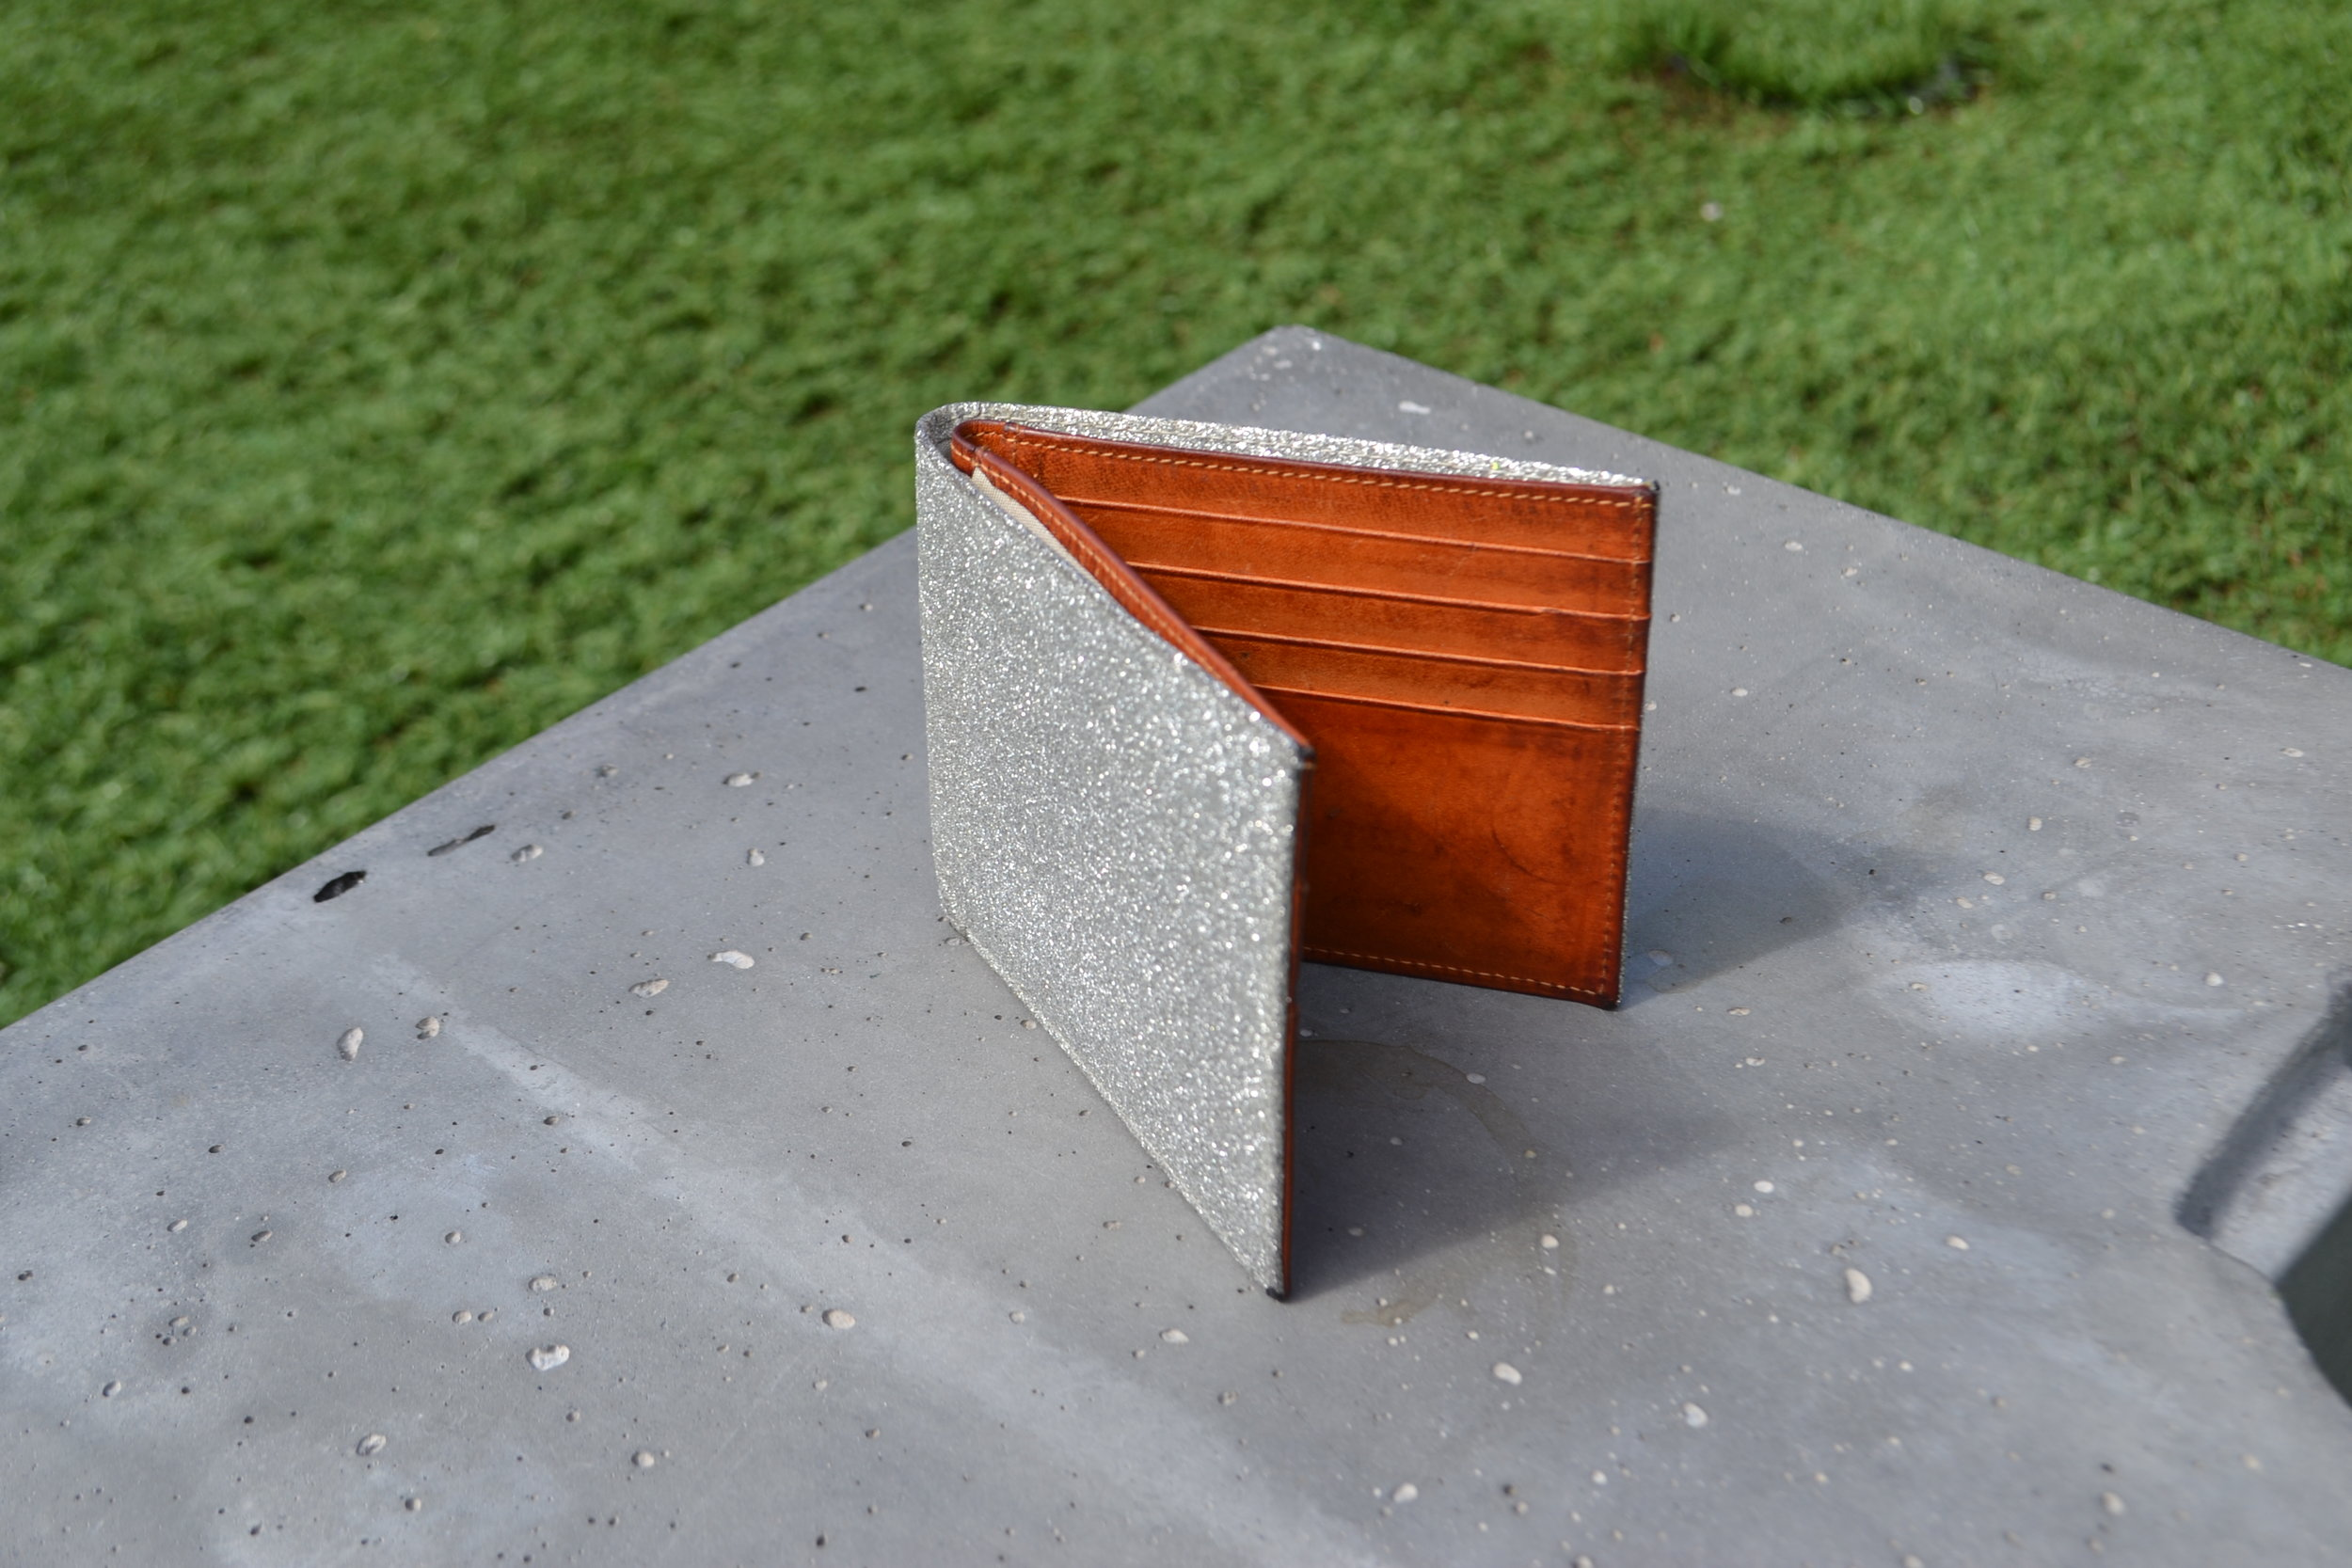 FEATURED: Maison Martin Margiela distressed glitter coated leather bi-fold wallet